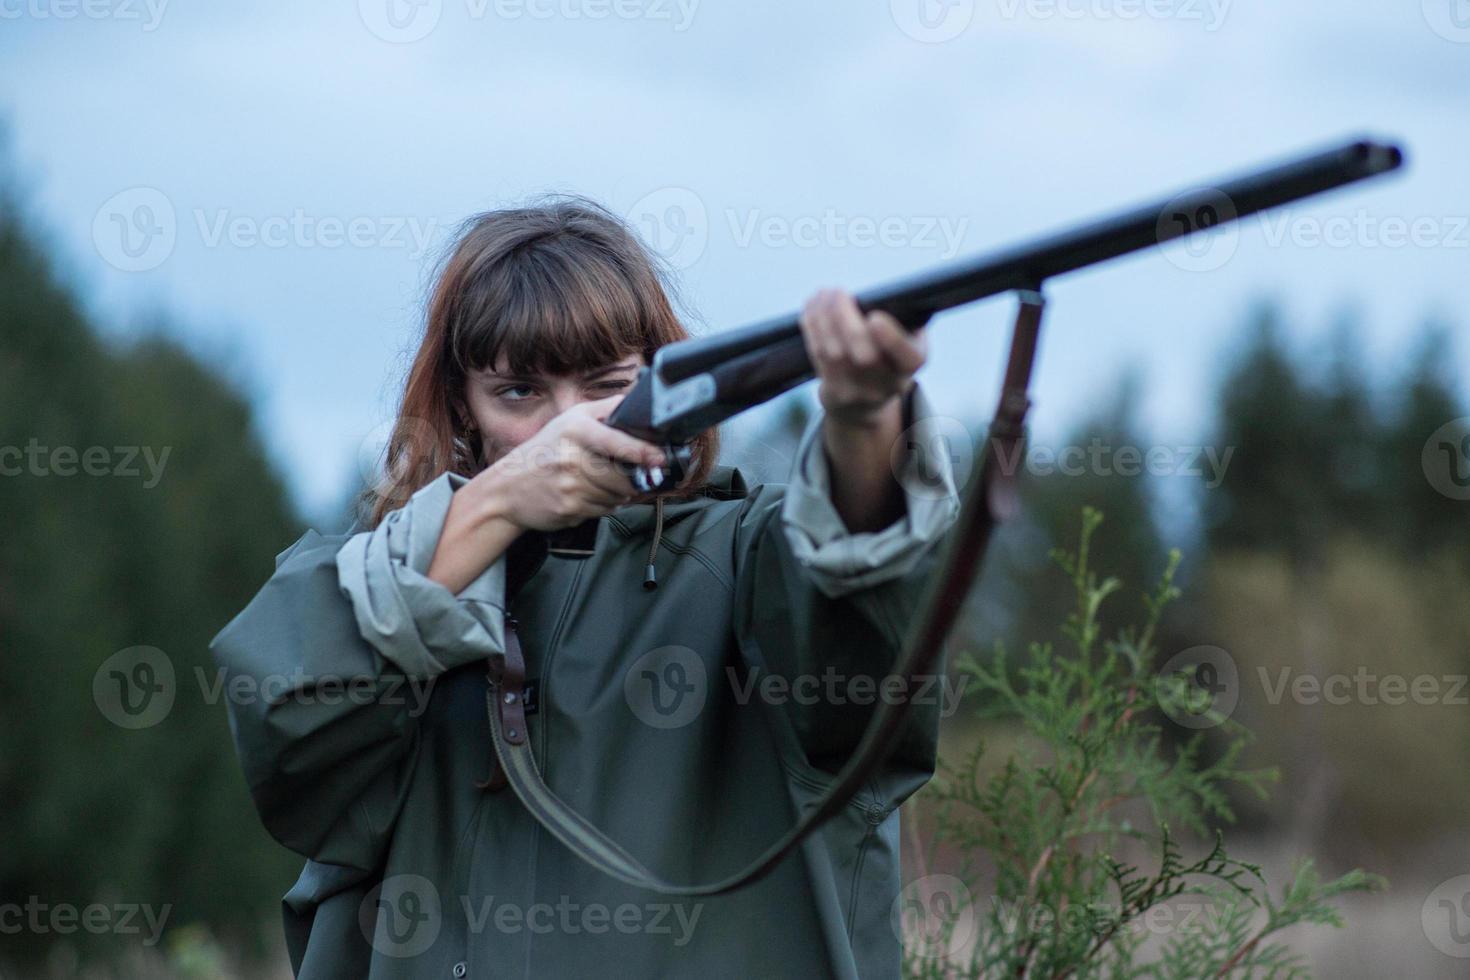 girl_hunting_shotgun photo